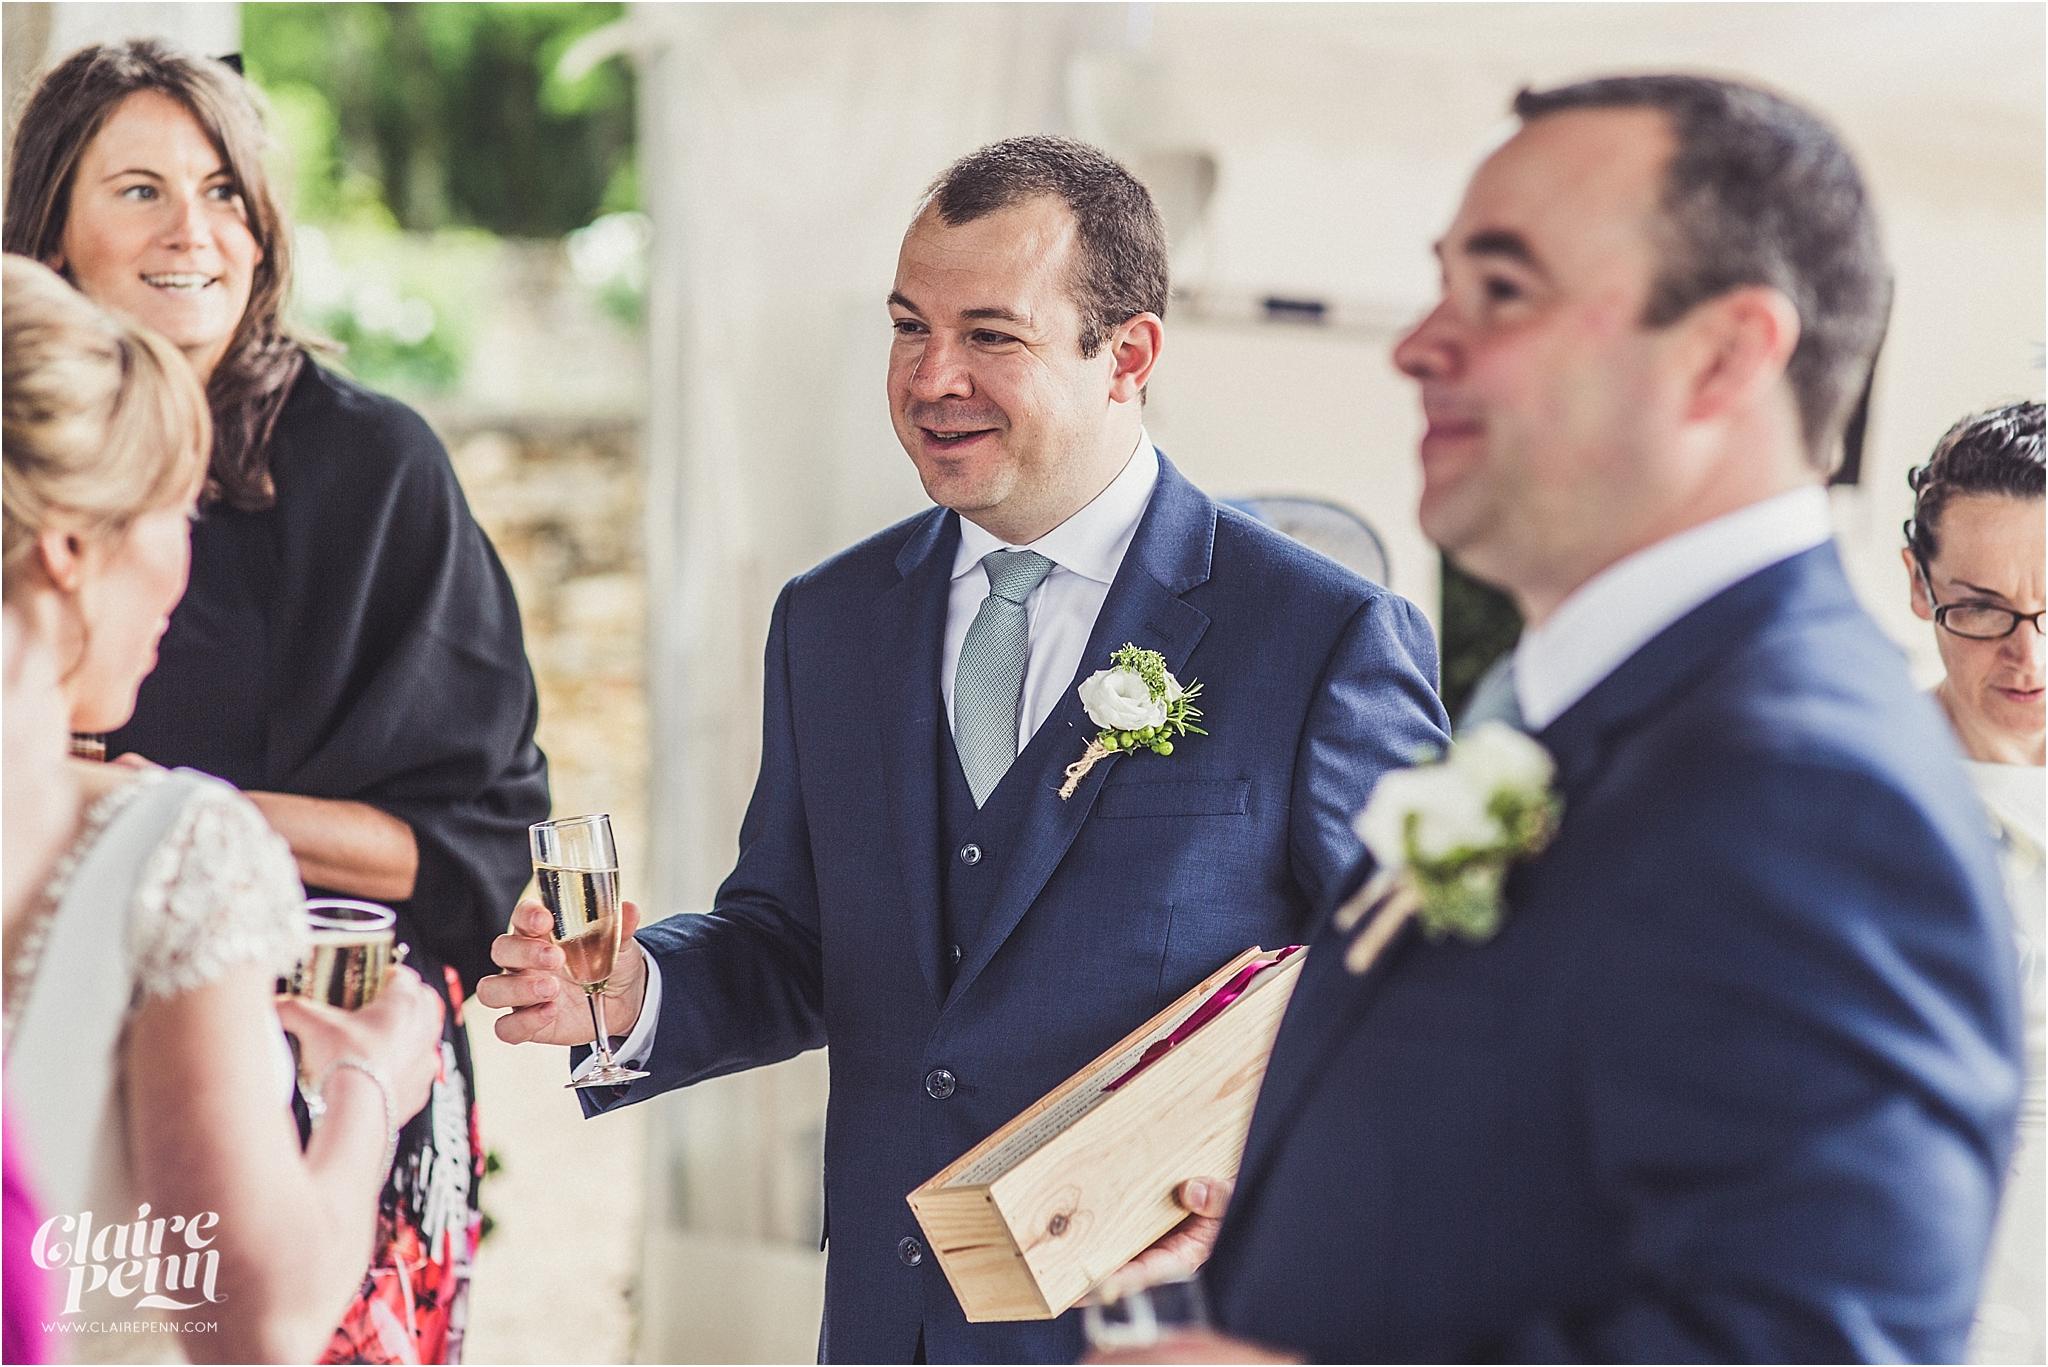 Elegant Domaine chateau wedding France00050.jpg